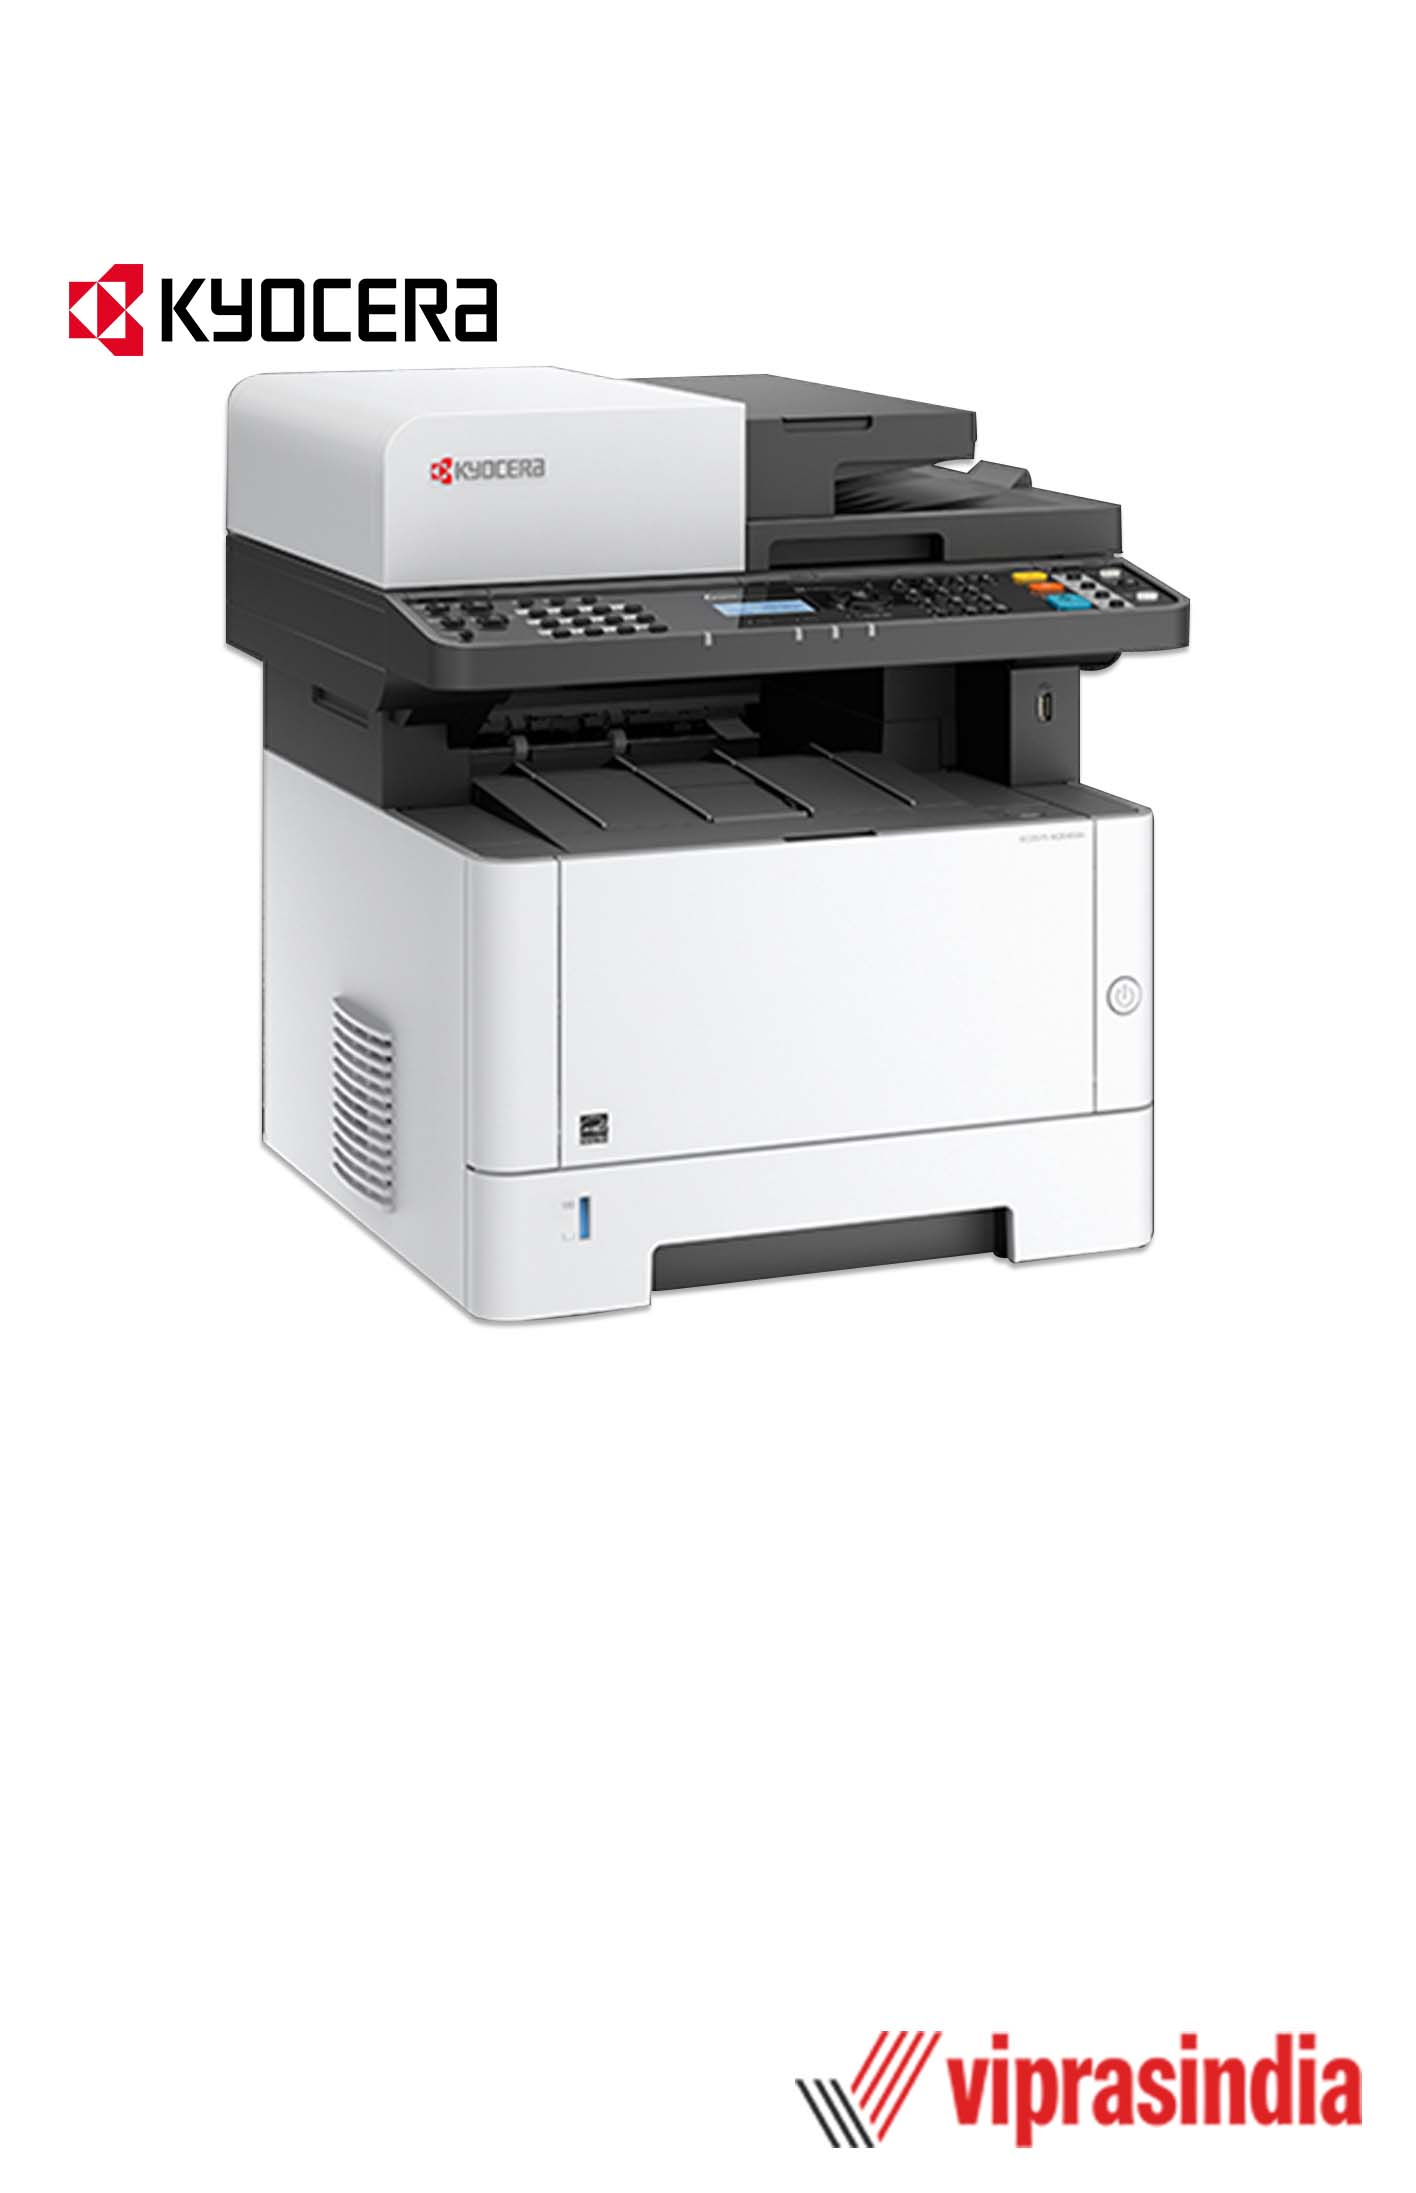 Printer Ecosys Kyocera M2040dn